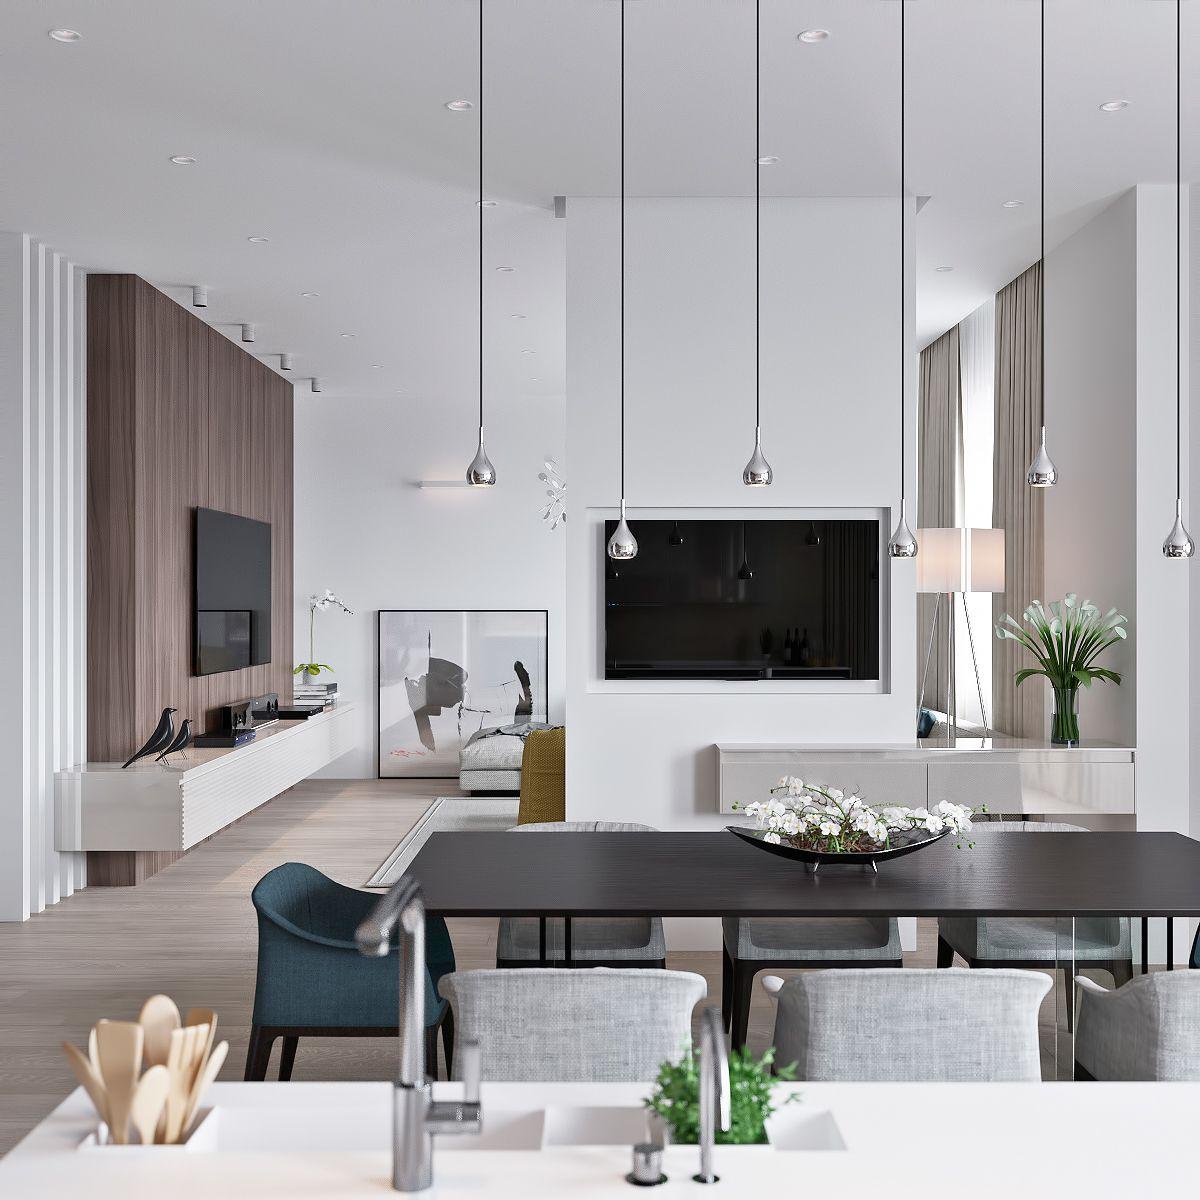 Work in progress architecture interior design simple house themes also interiores diseno casas rh cl pinterest